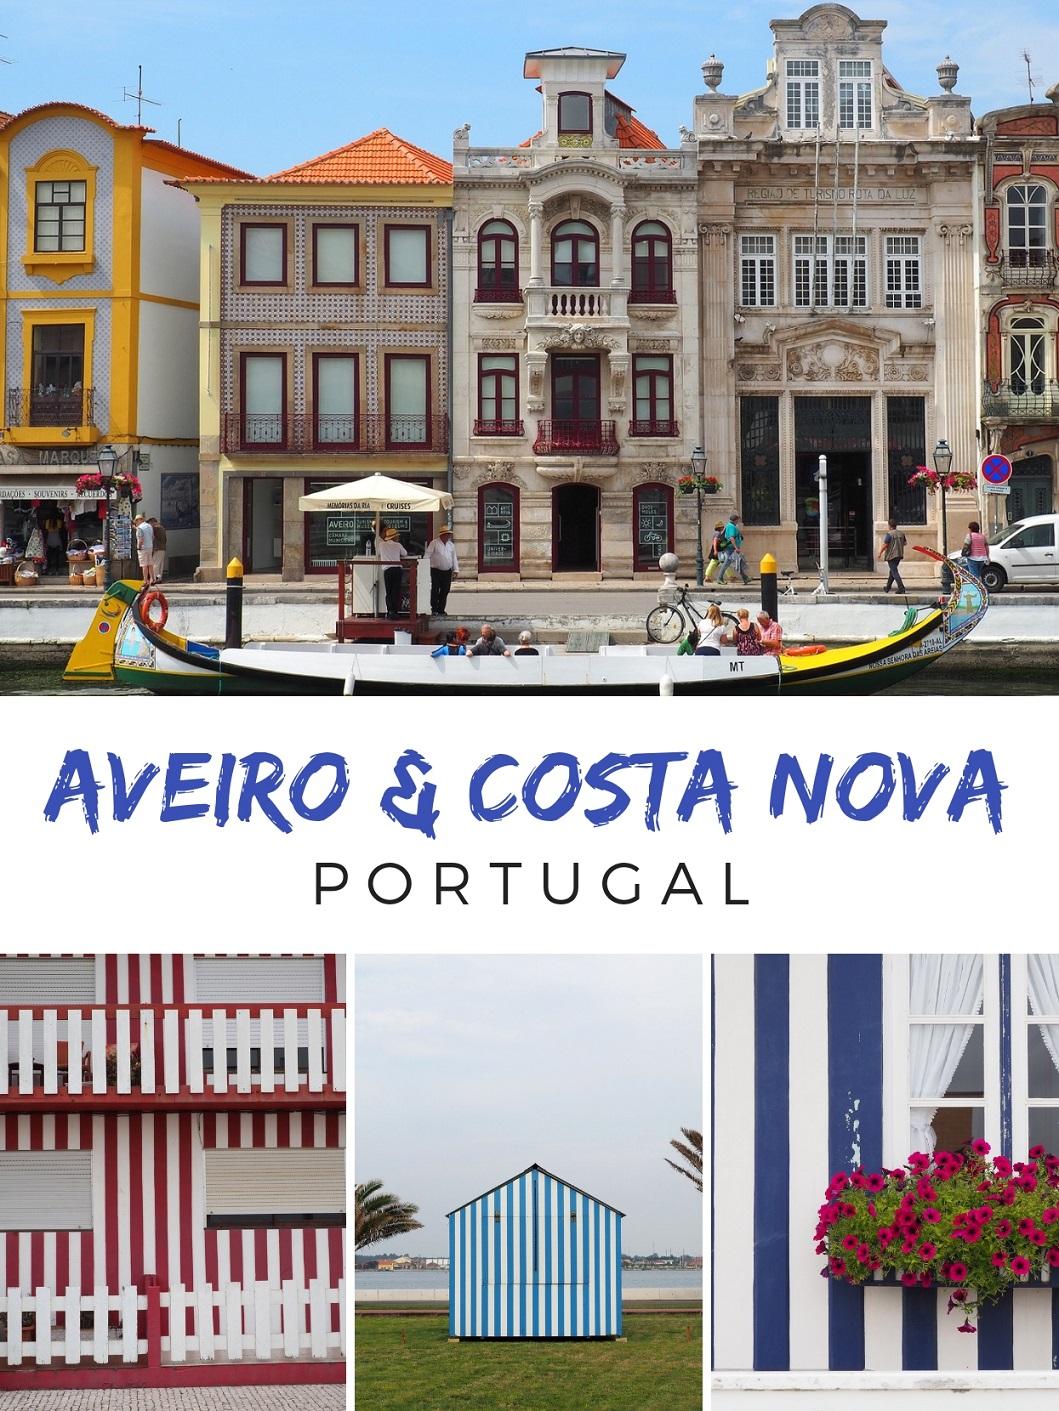 Les couleurs d'Aveiro et Costa Nova au Portugal